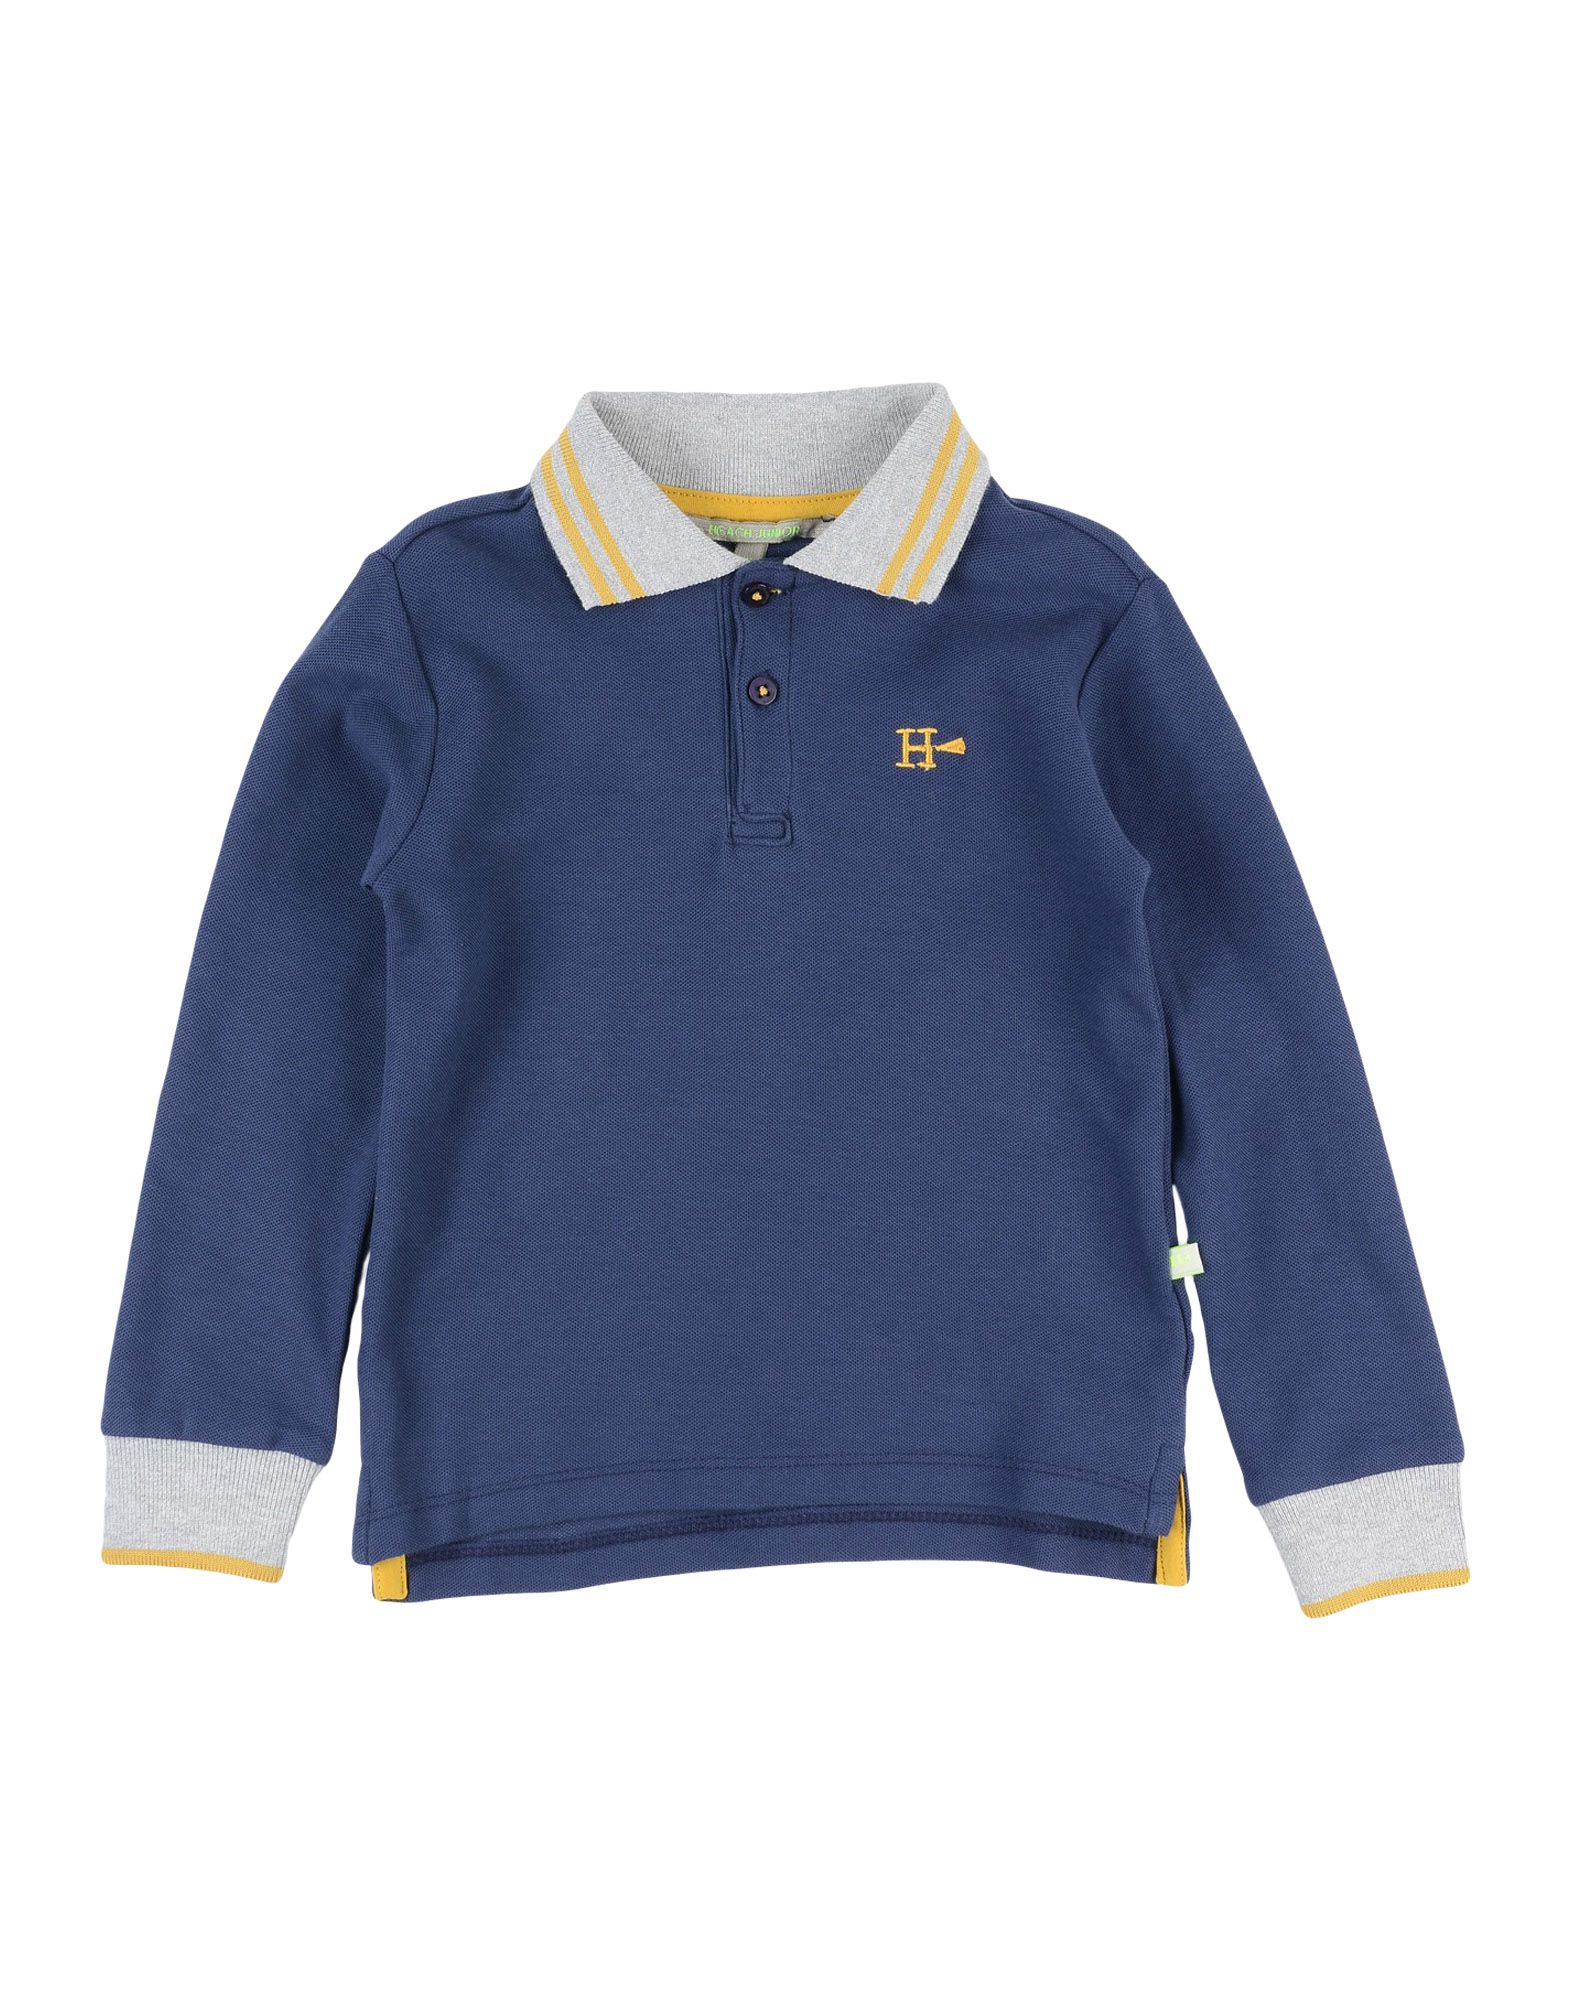 bfefc741f Heach Junior By Silvian Heach Polo Shirt Boy 0-24 months online on ...